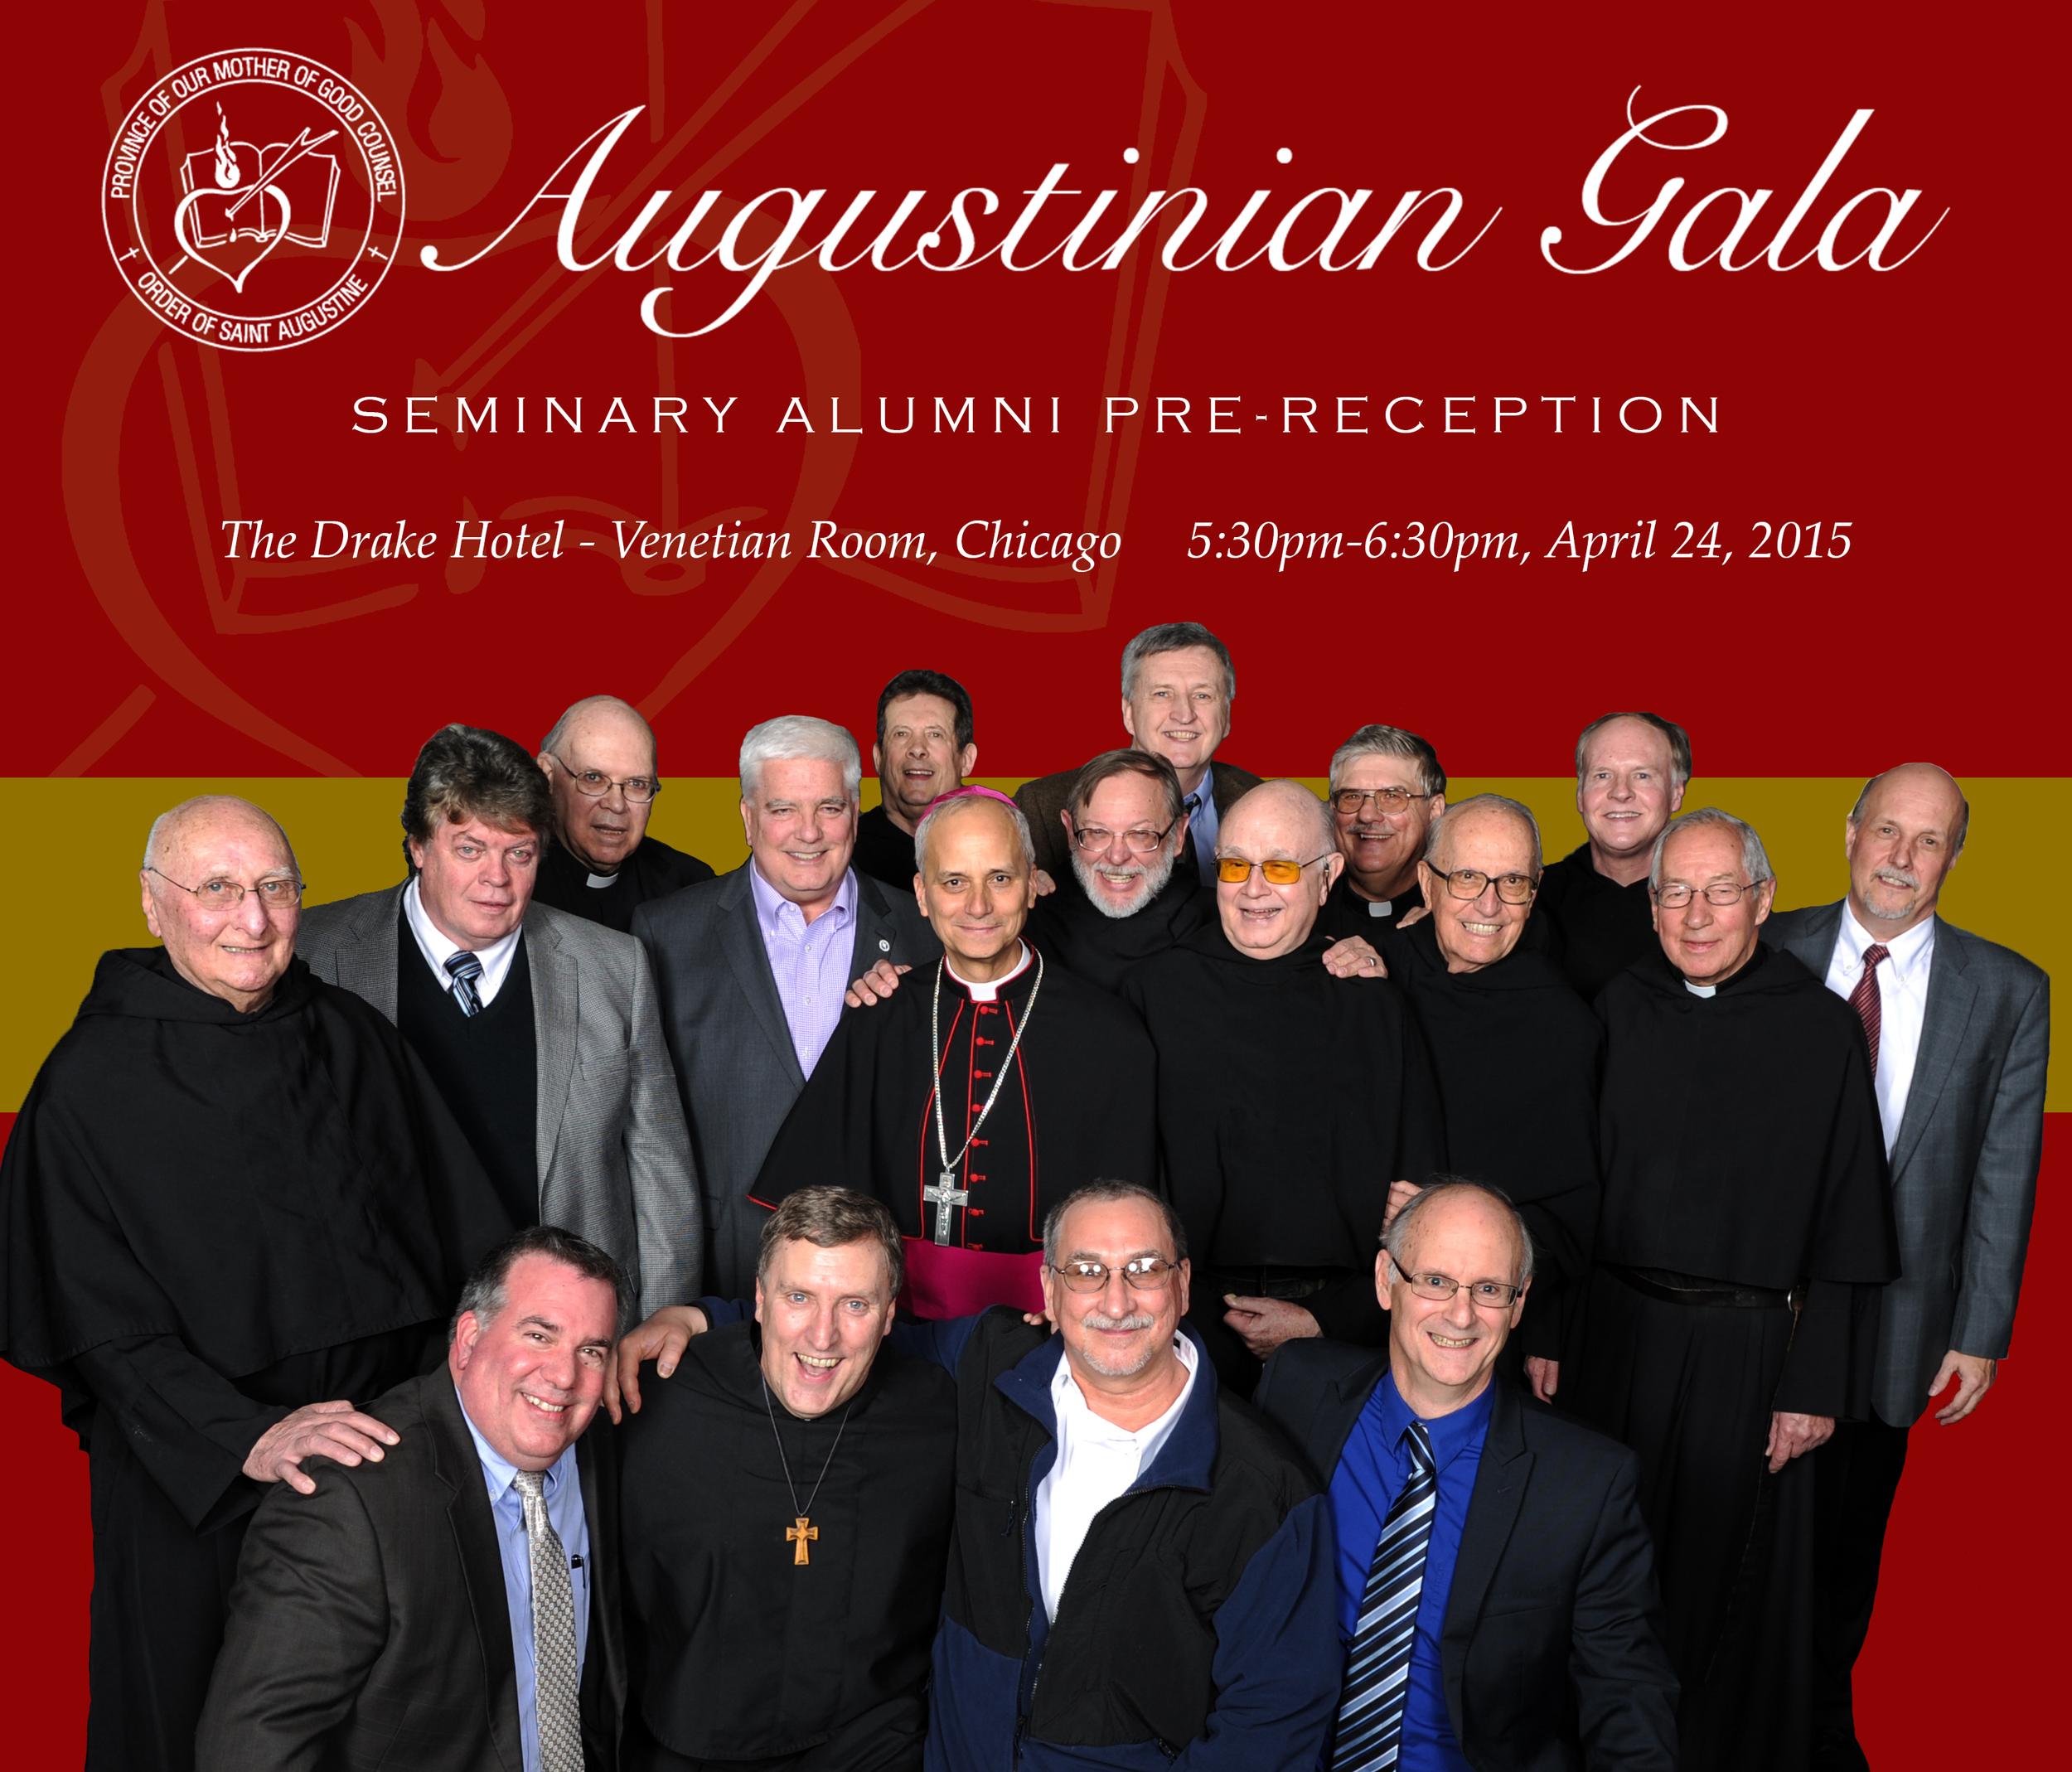 Augustinian Seminary Alumni Pre-Reception